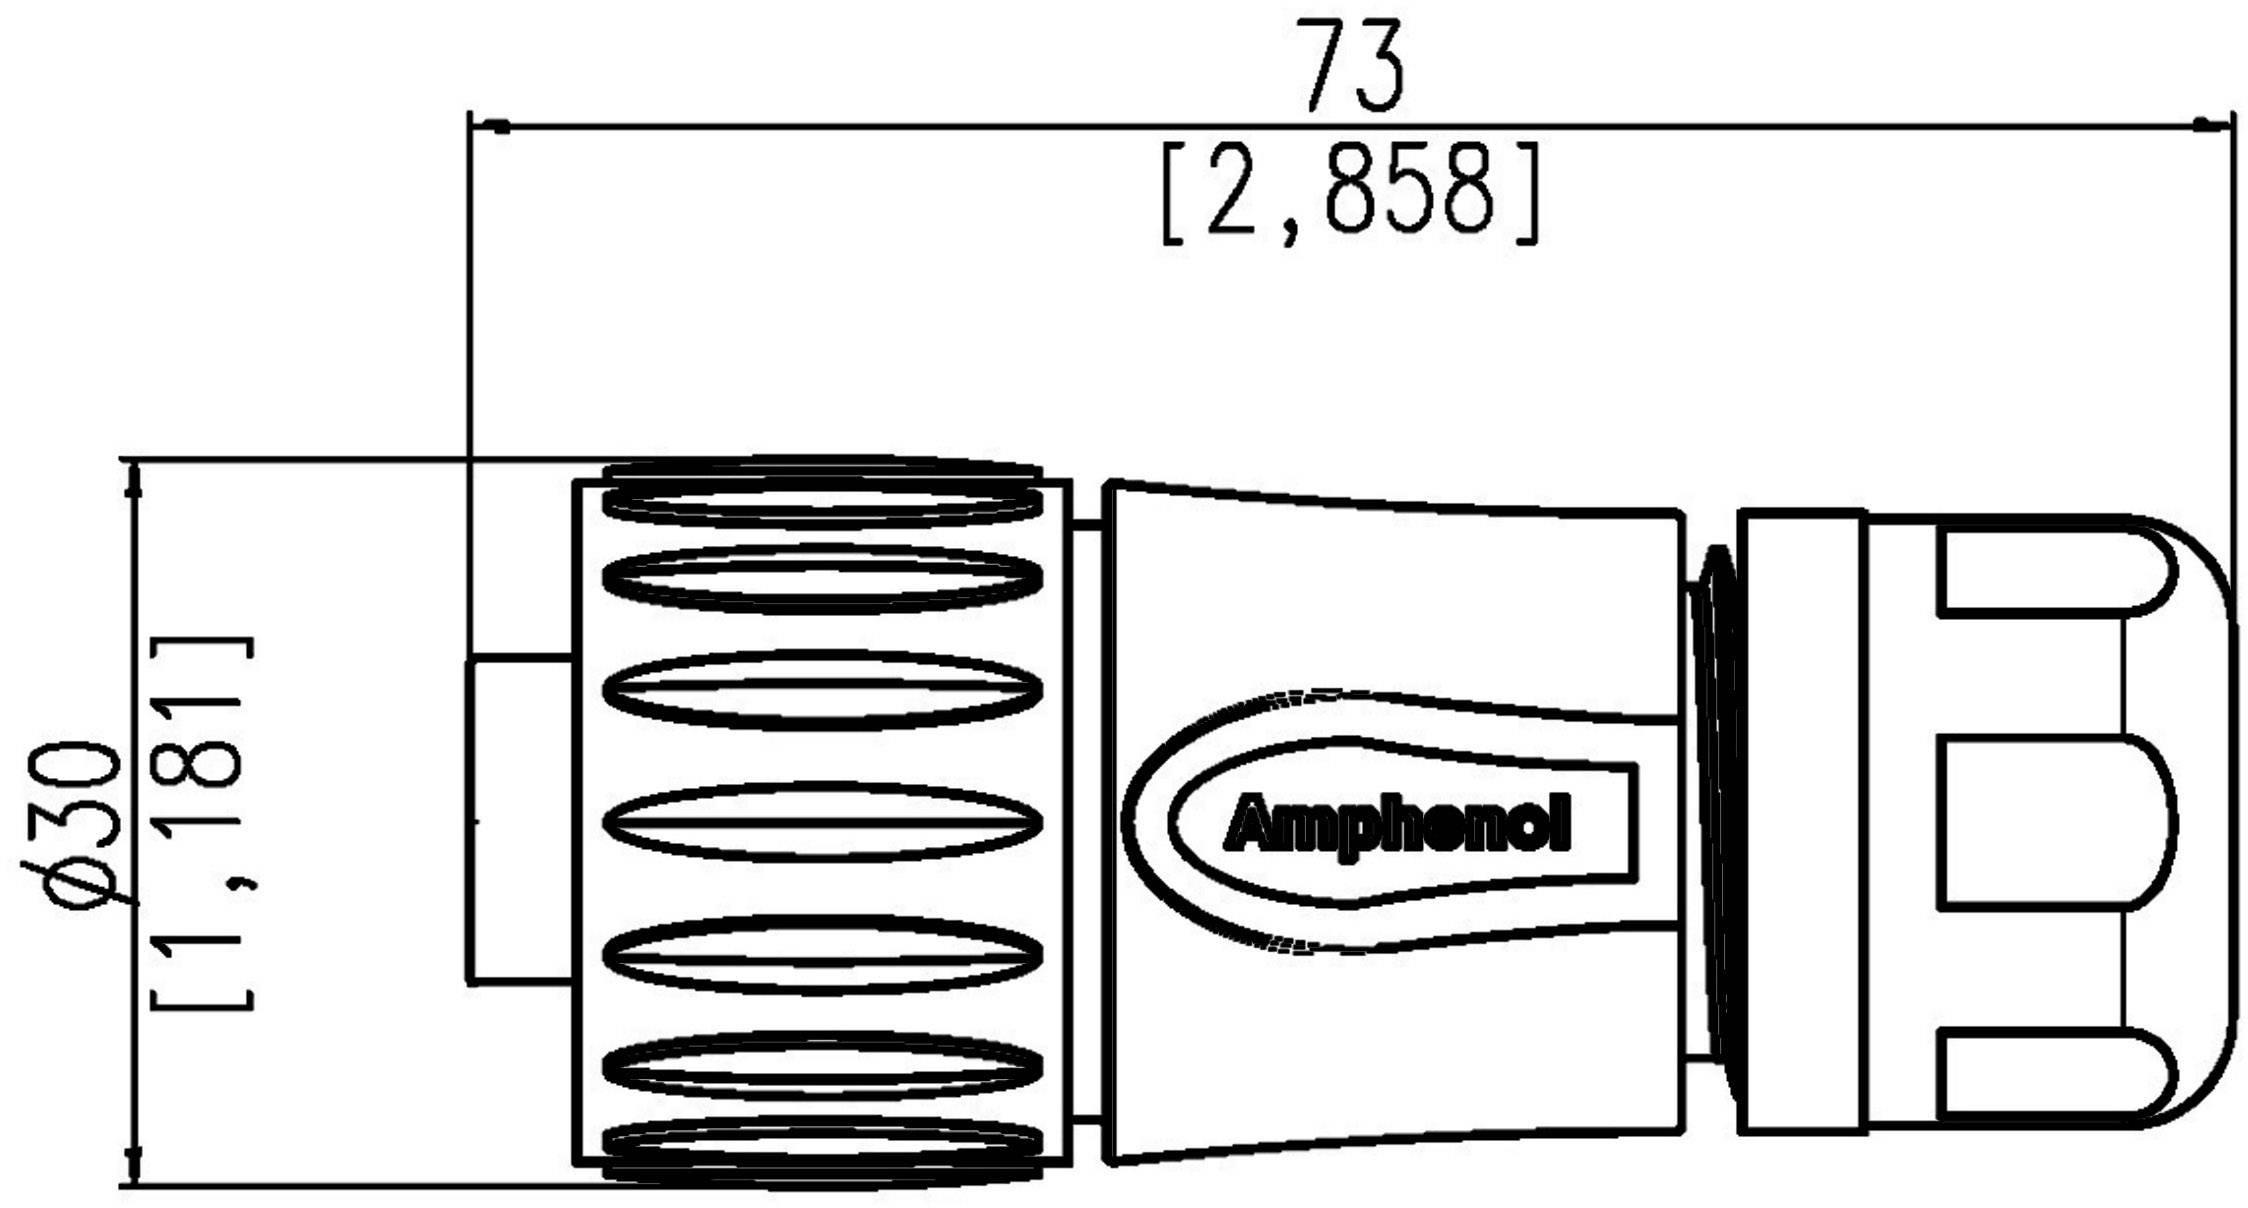 Kabelový konektor 6+PE Amphenol C016 30H006 110 12, černá